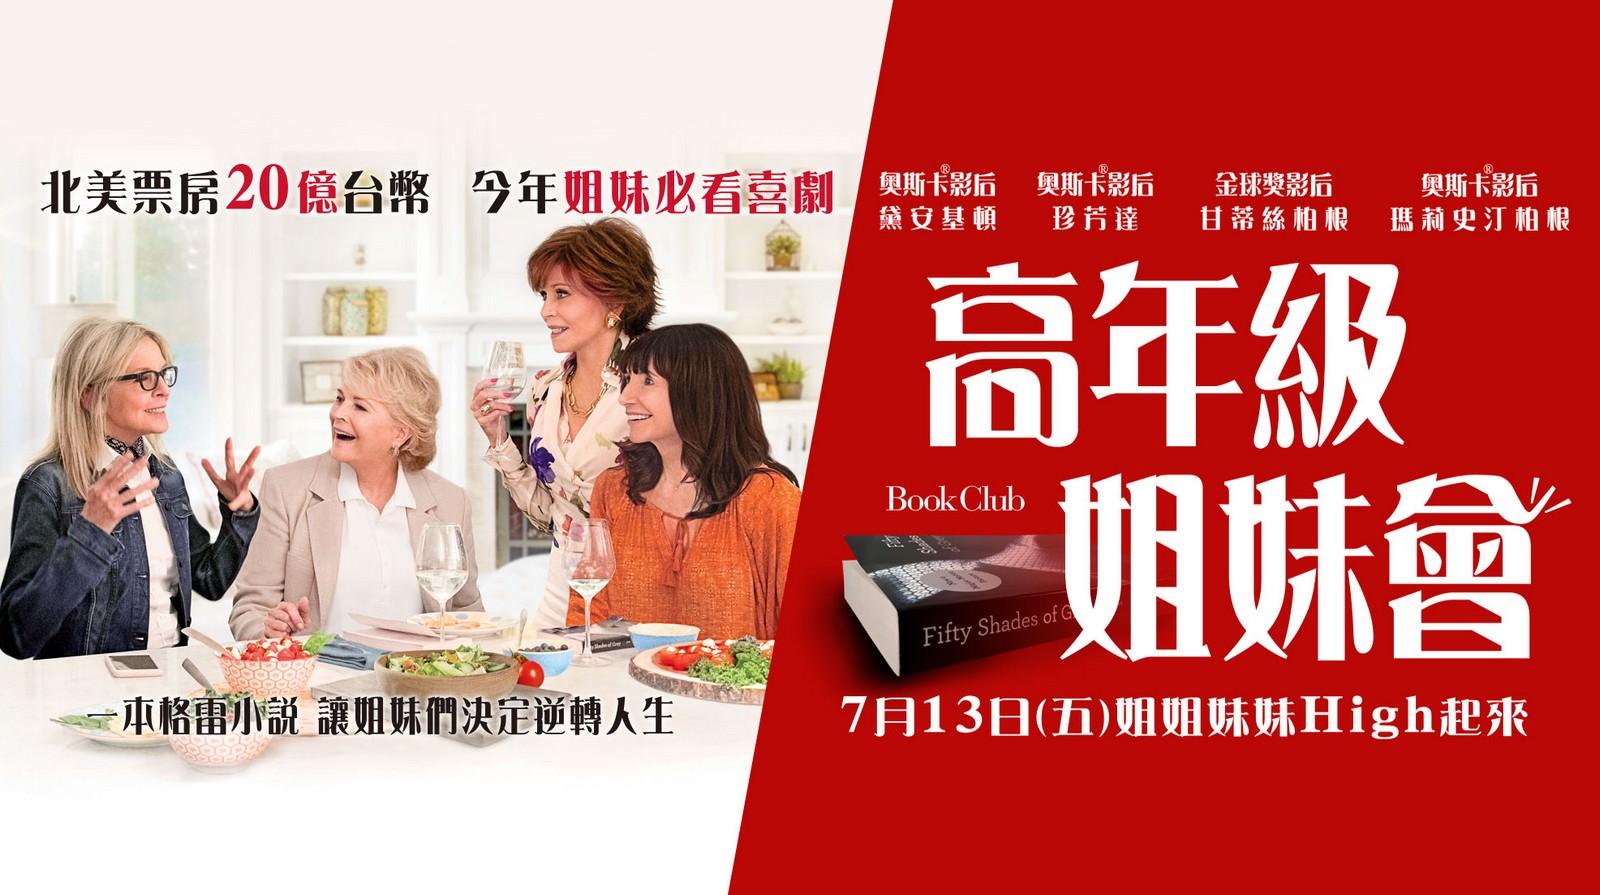 Movie, Book Club(美國) / 高年級姐妹會(台) / 读书会(網), 電影海報, 台灣, 橫版